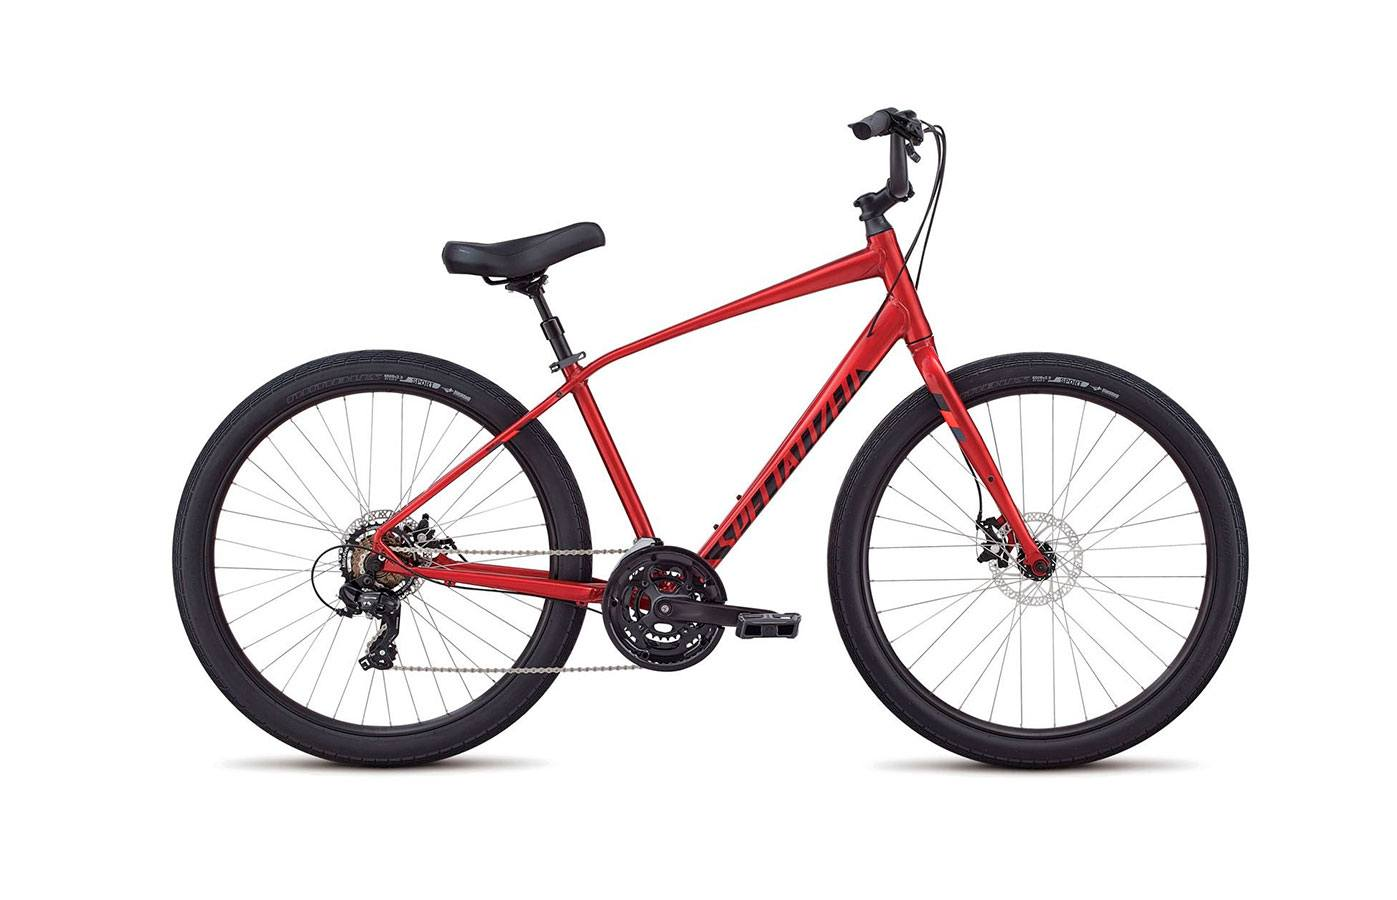 Bicicletas Villas Etnia